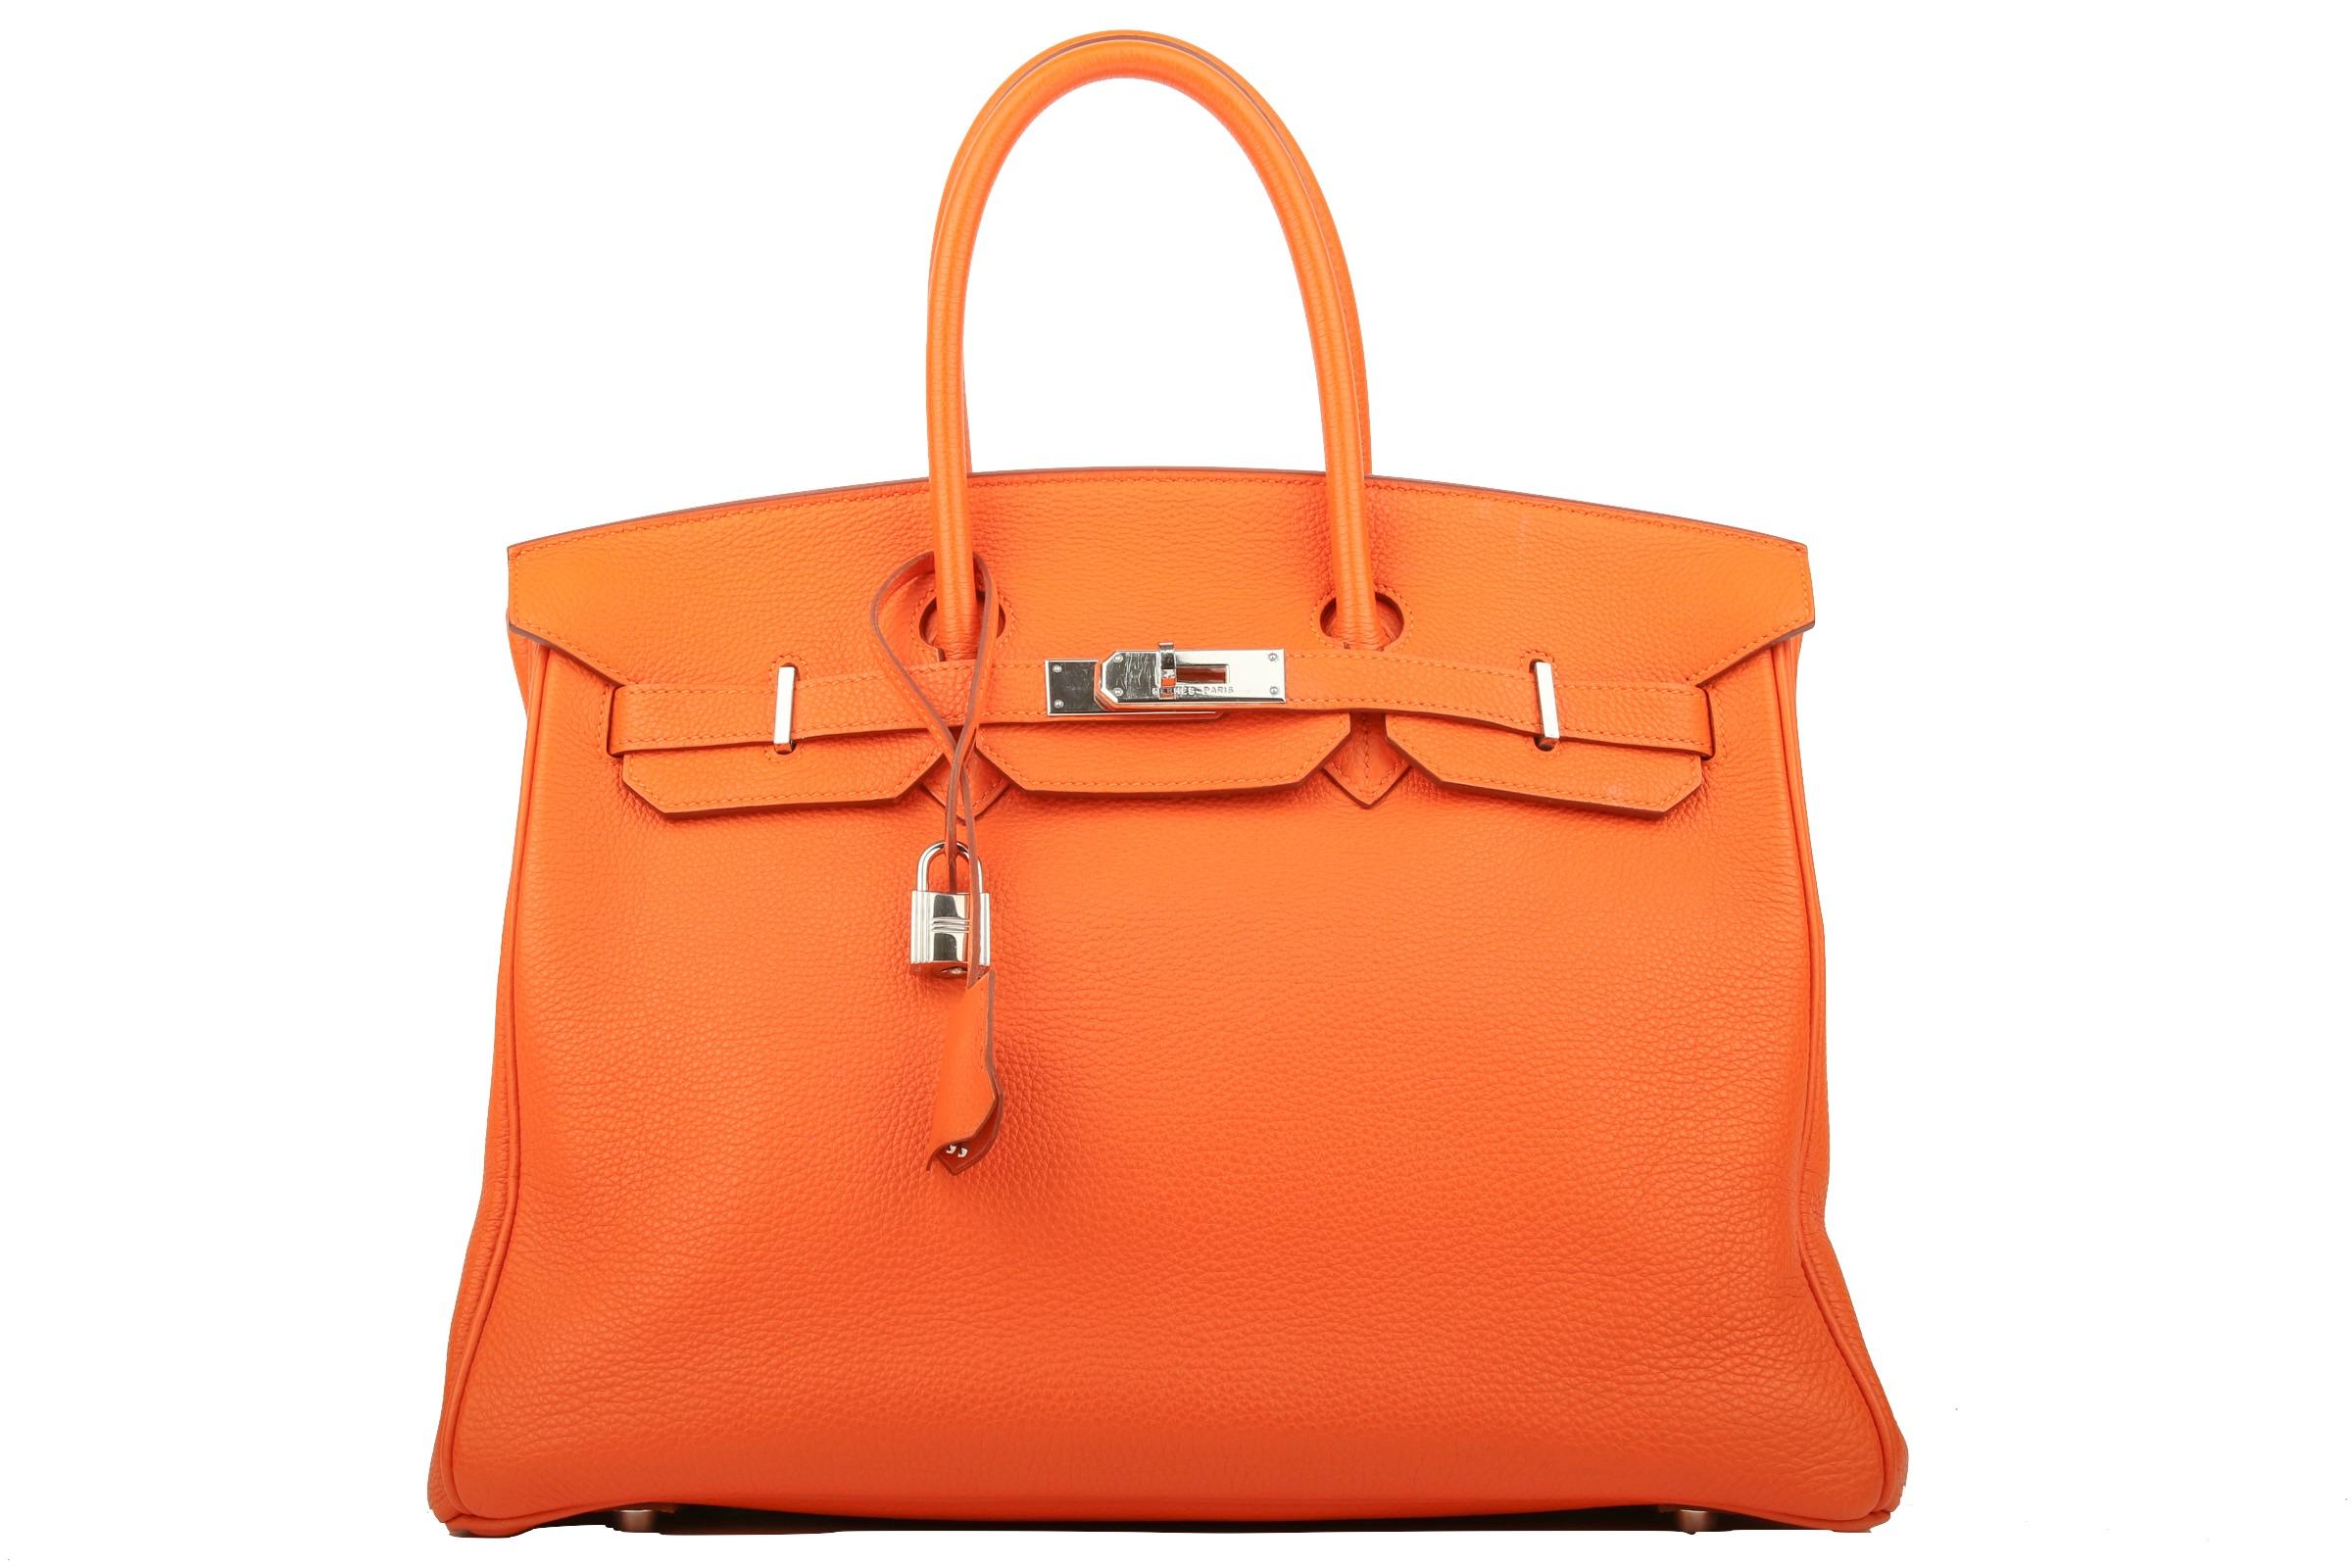 Hermès Birkin 35 Orange Togo leather  6a024dec6121